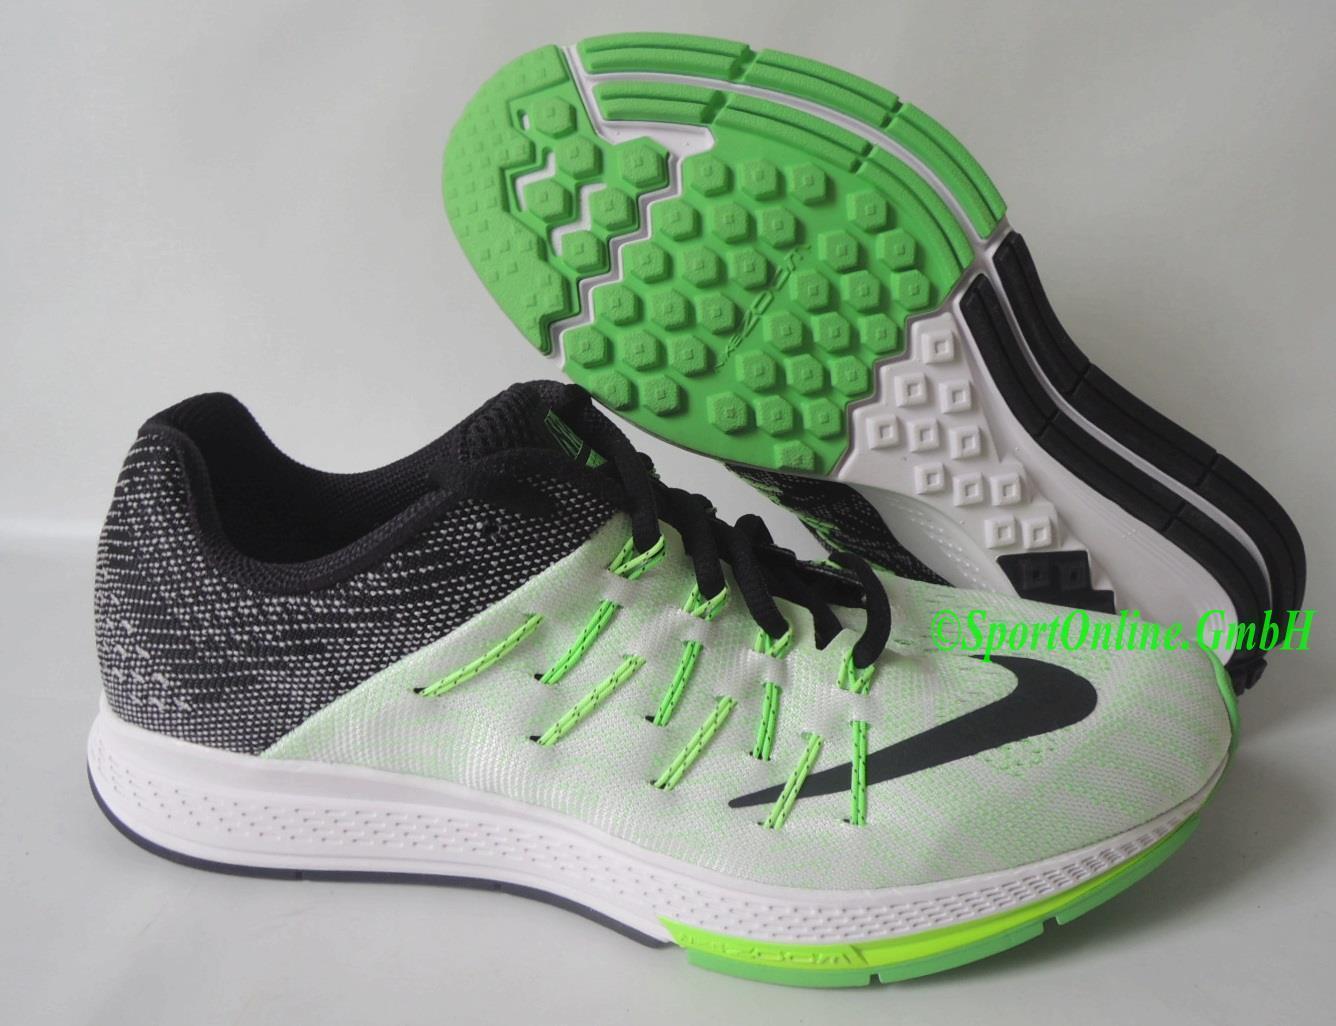 NEU Nike Air Zoom Elite 8 Herren Running Schuhe Gr. 42,5 Laufschuhe 748588-103